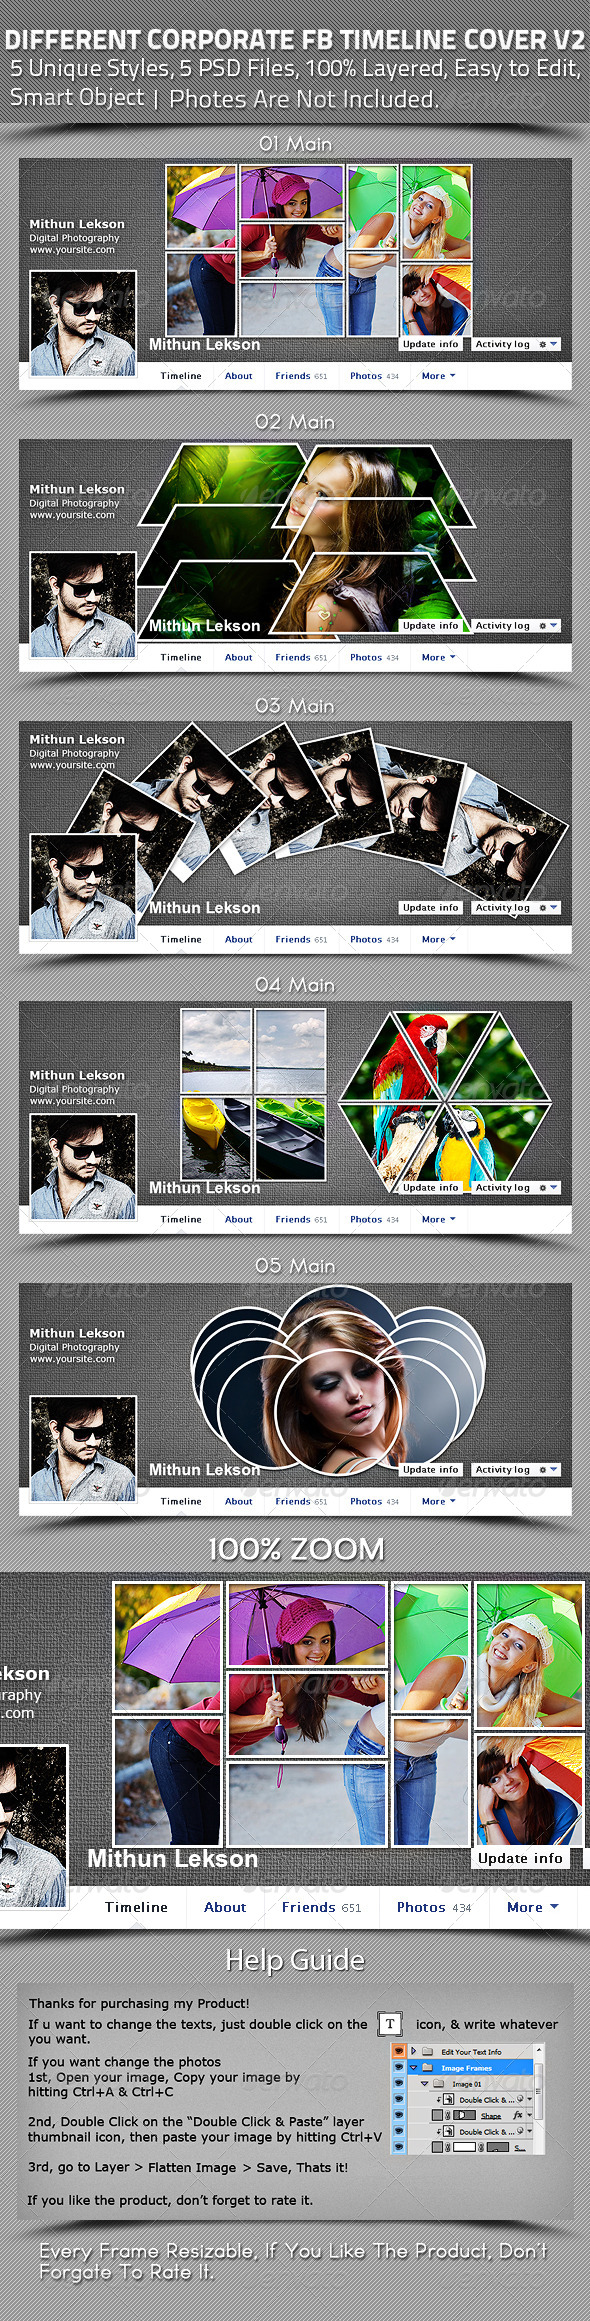 Different Corporate Facebook Timeline Cover V2 - Facebook Timeline Covers Social Media